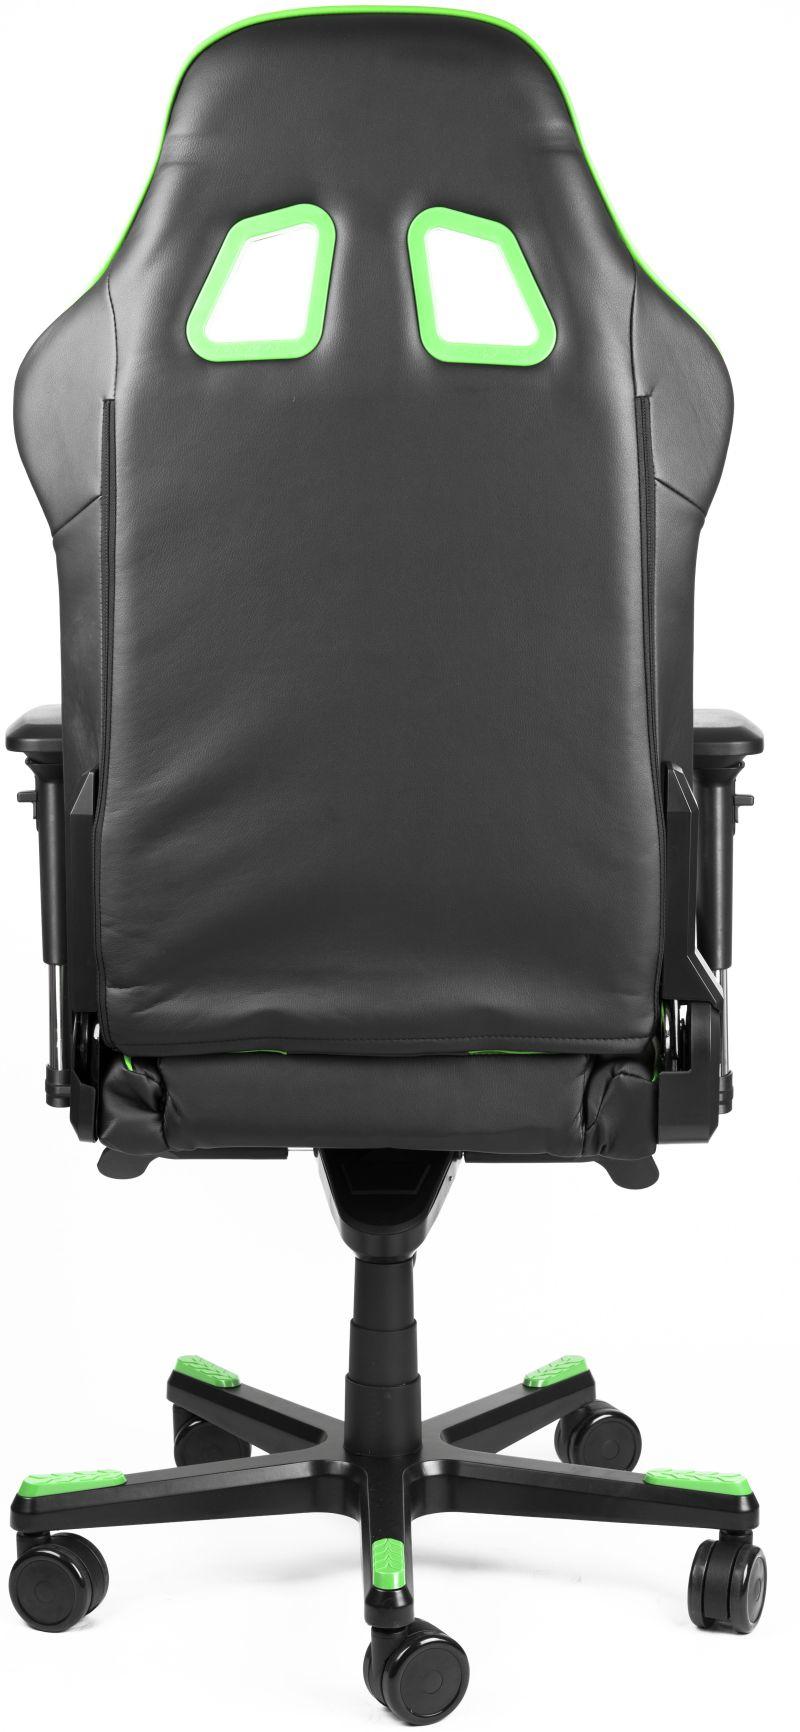 DXRacer King Series Black/Green Gaming Chair